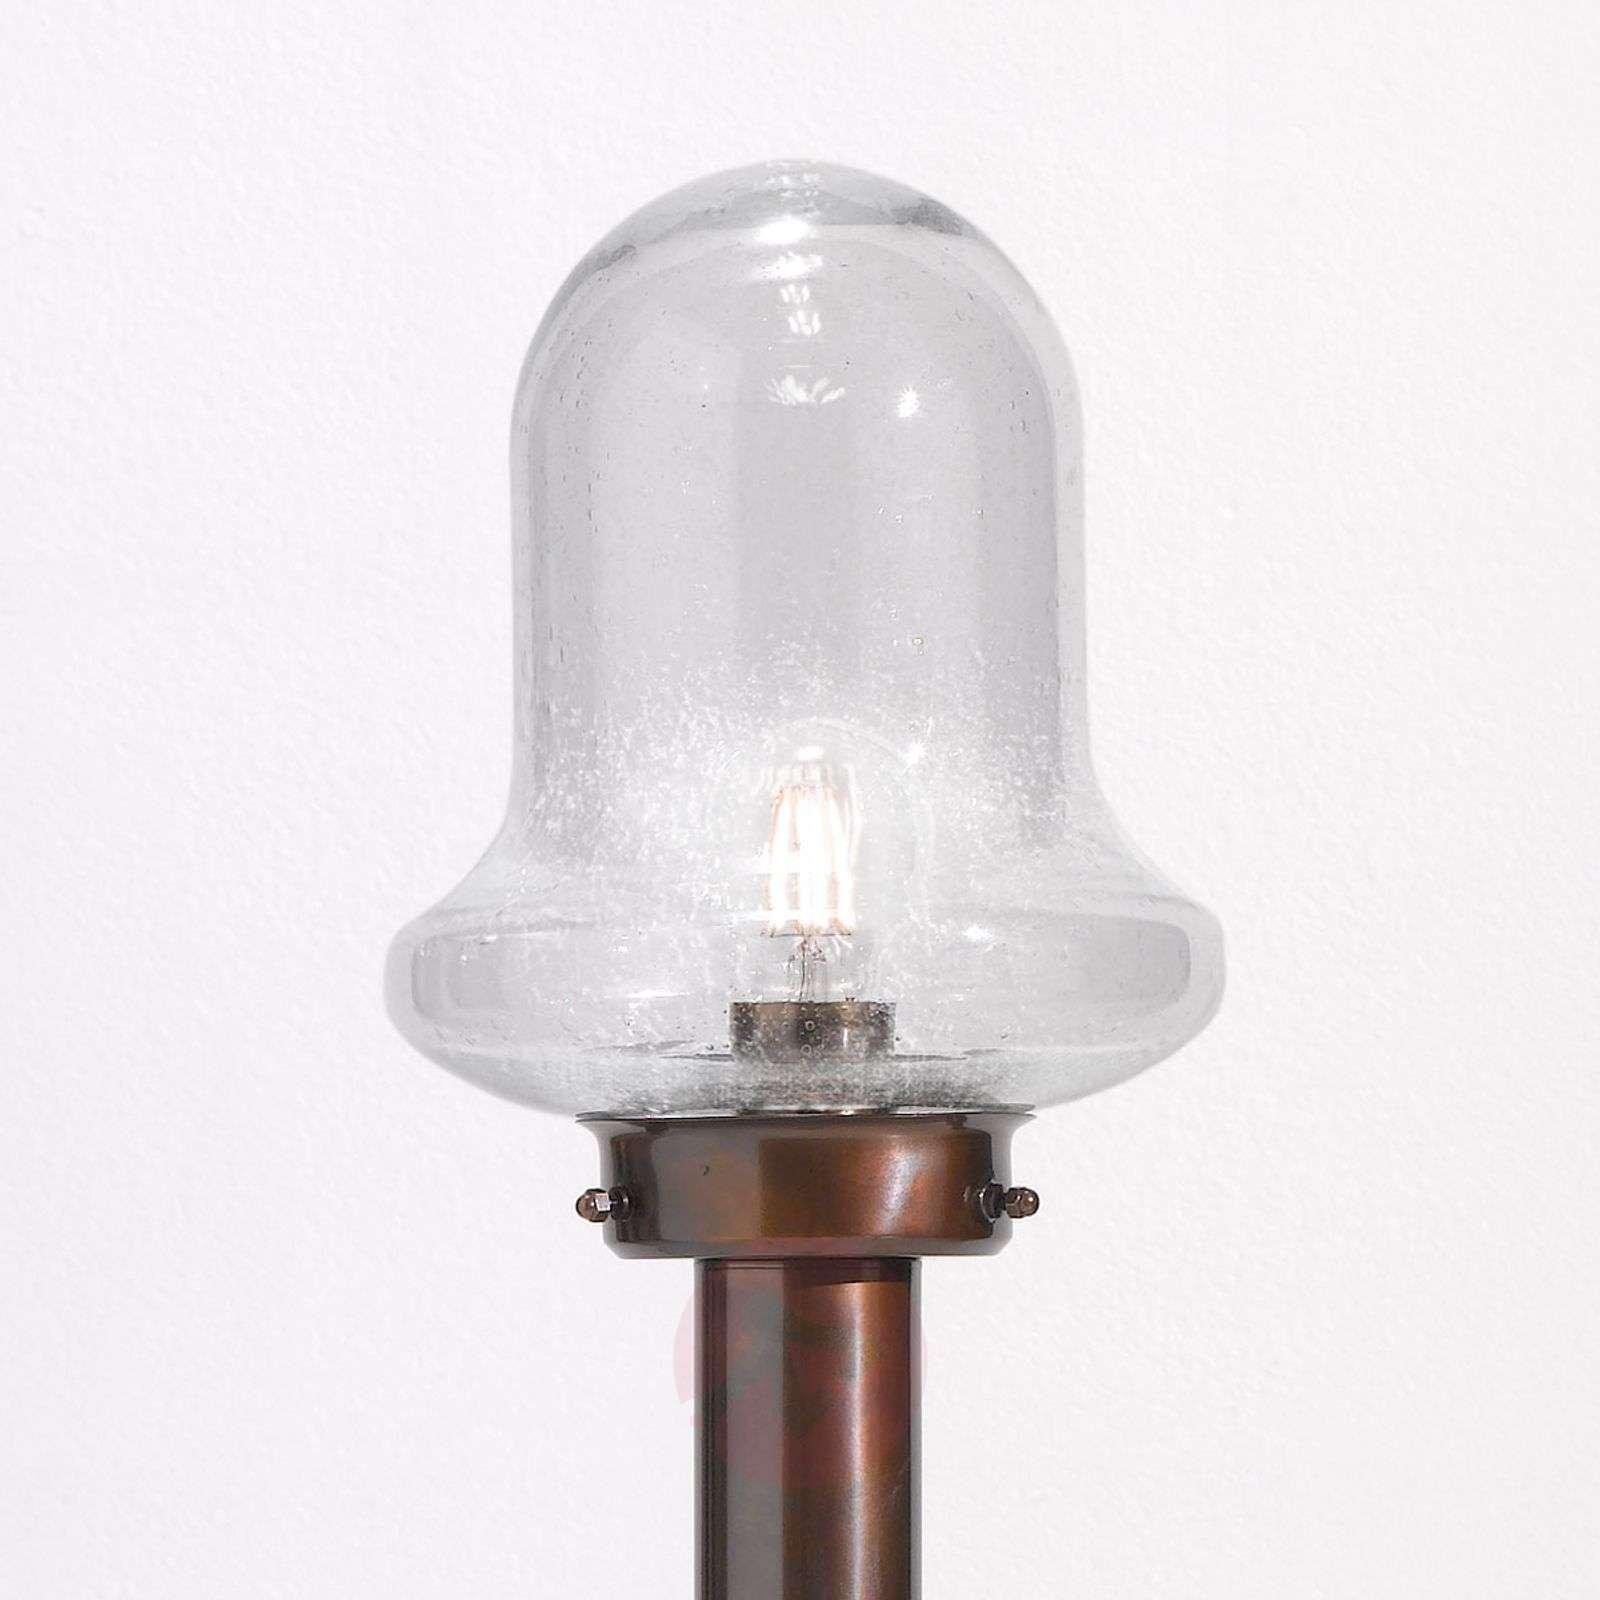 High-quality Casale path light, 142cm high-2008254-01